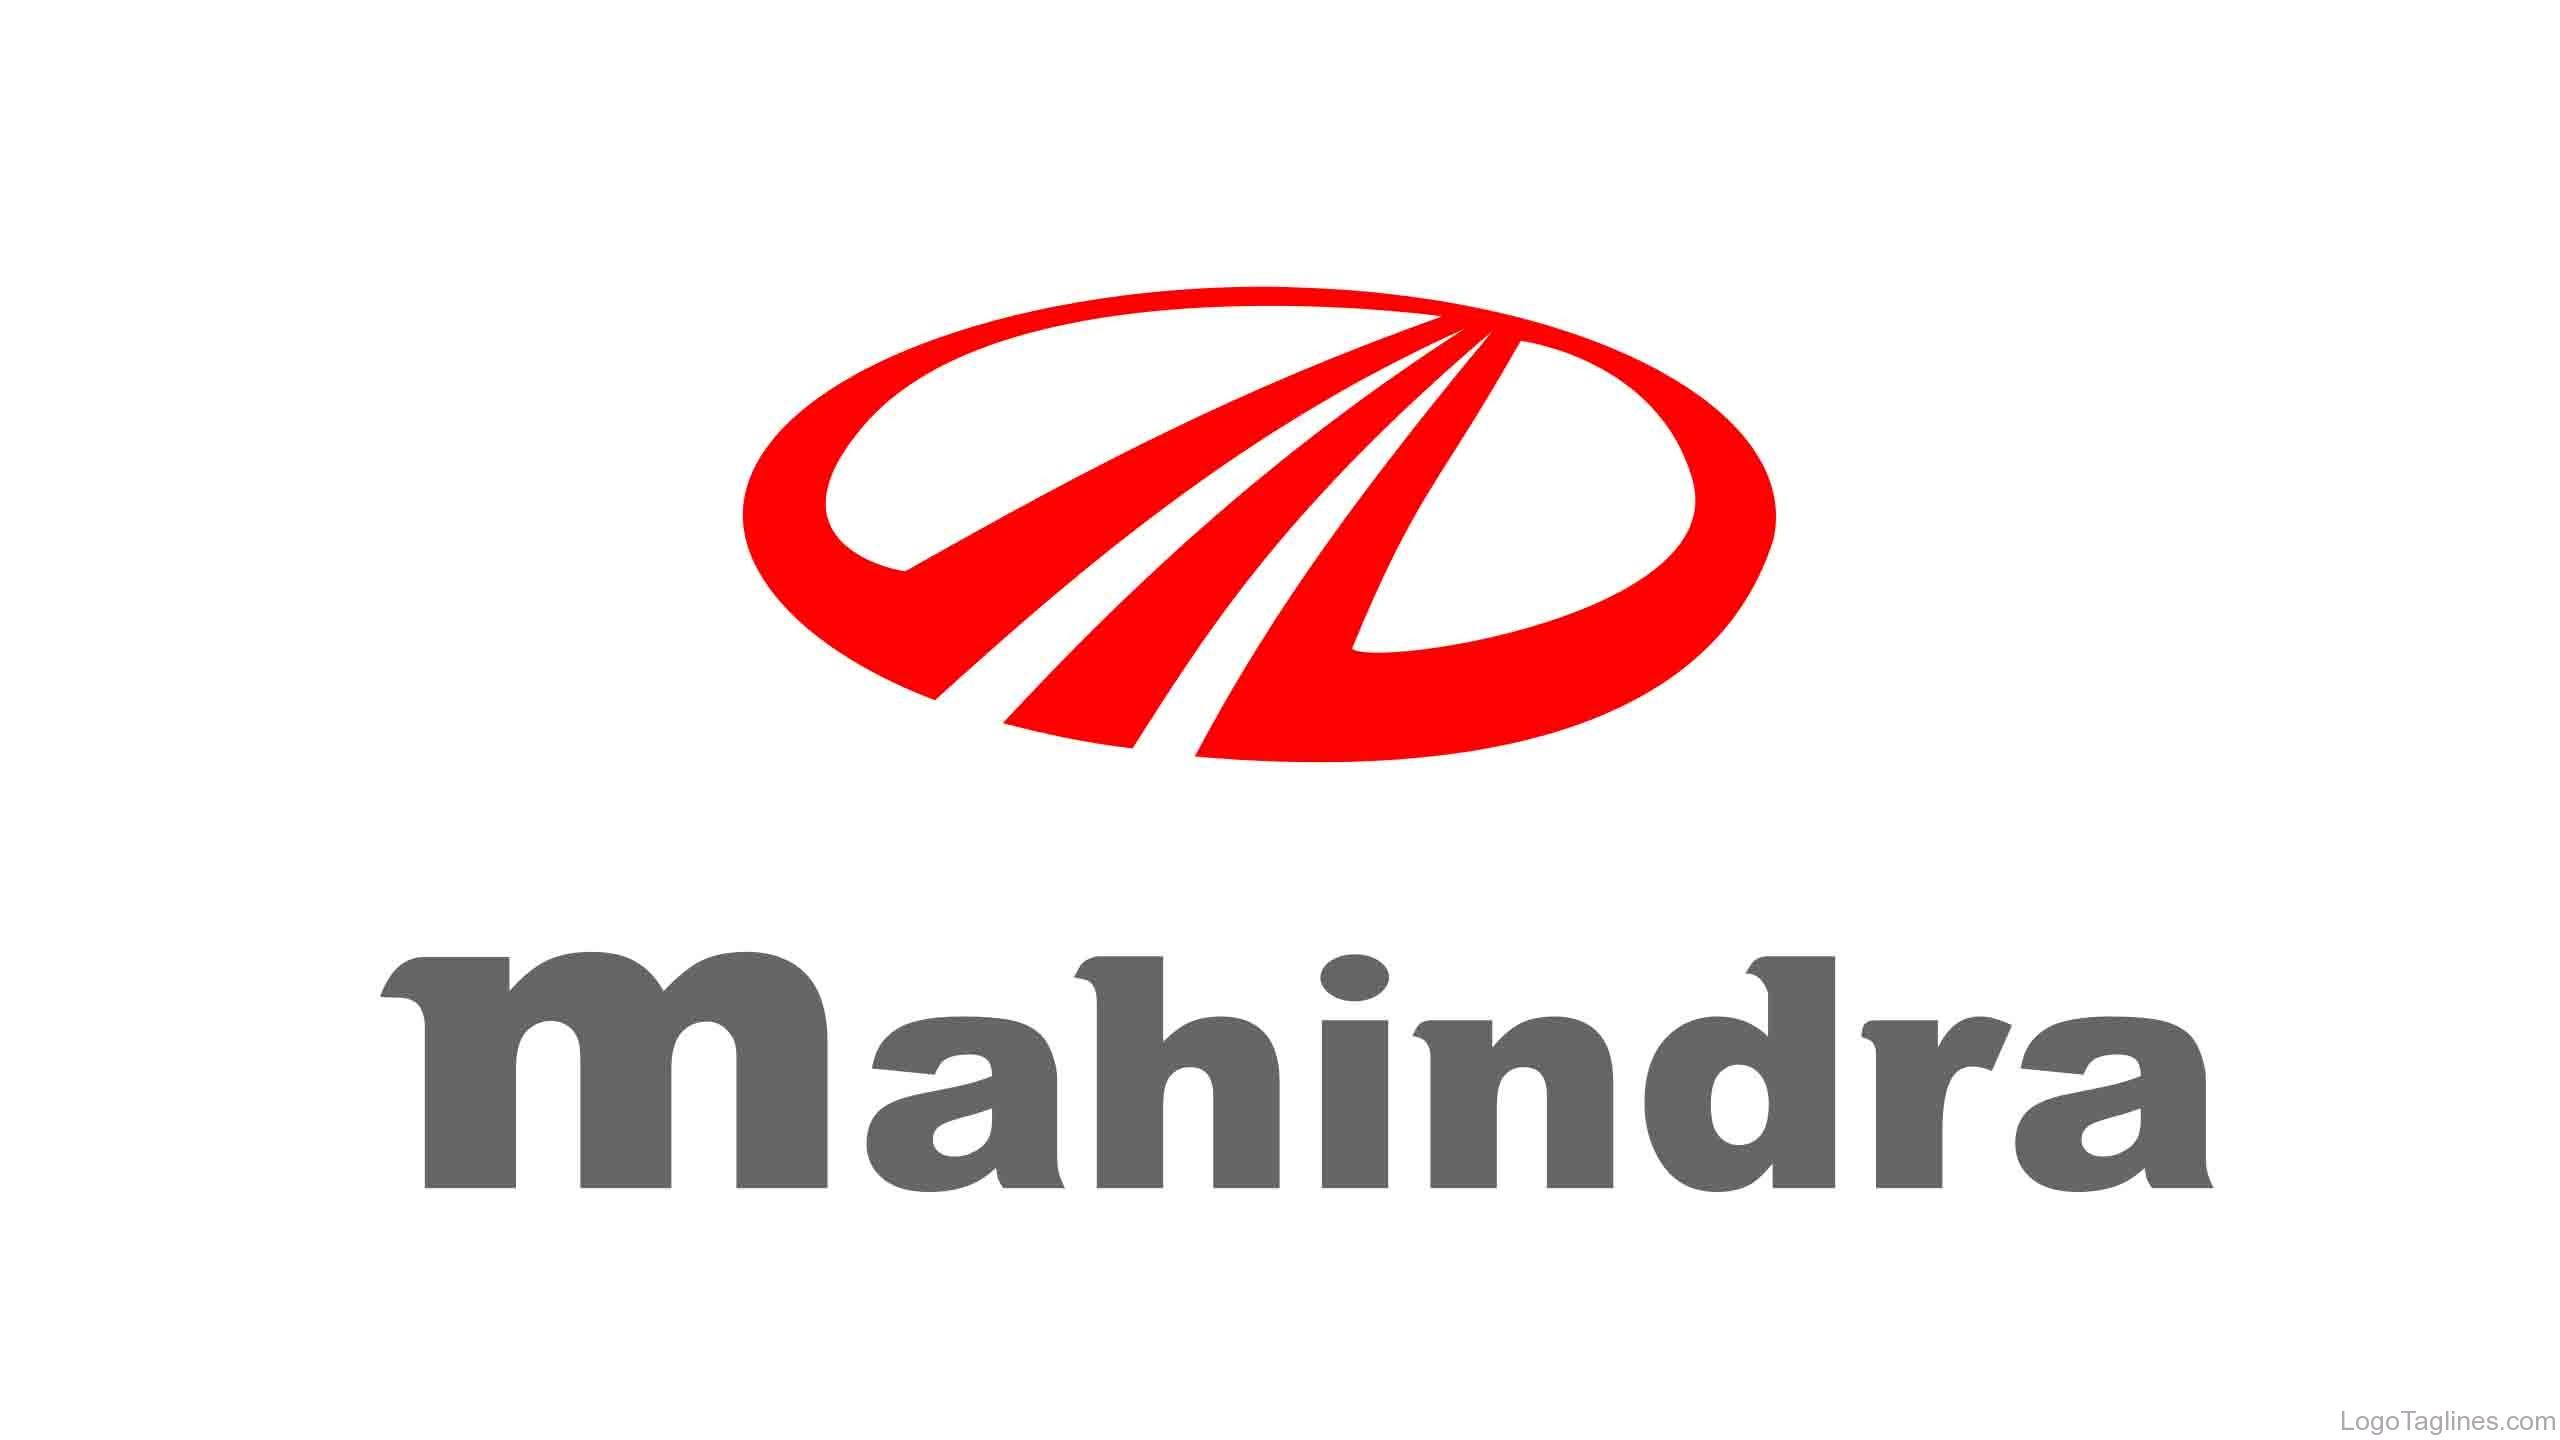 Mahindra and mahindra logo and tagline buycottarizona Image collections